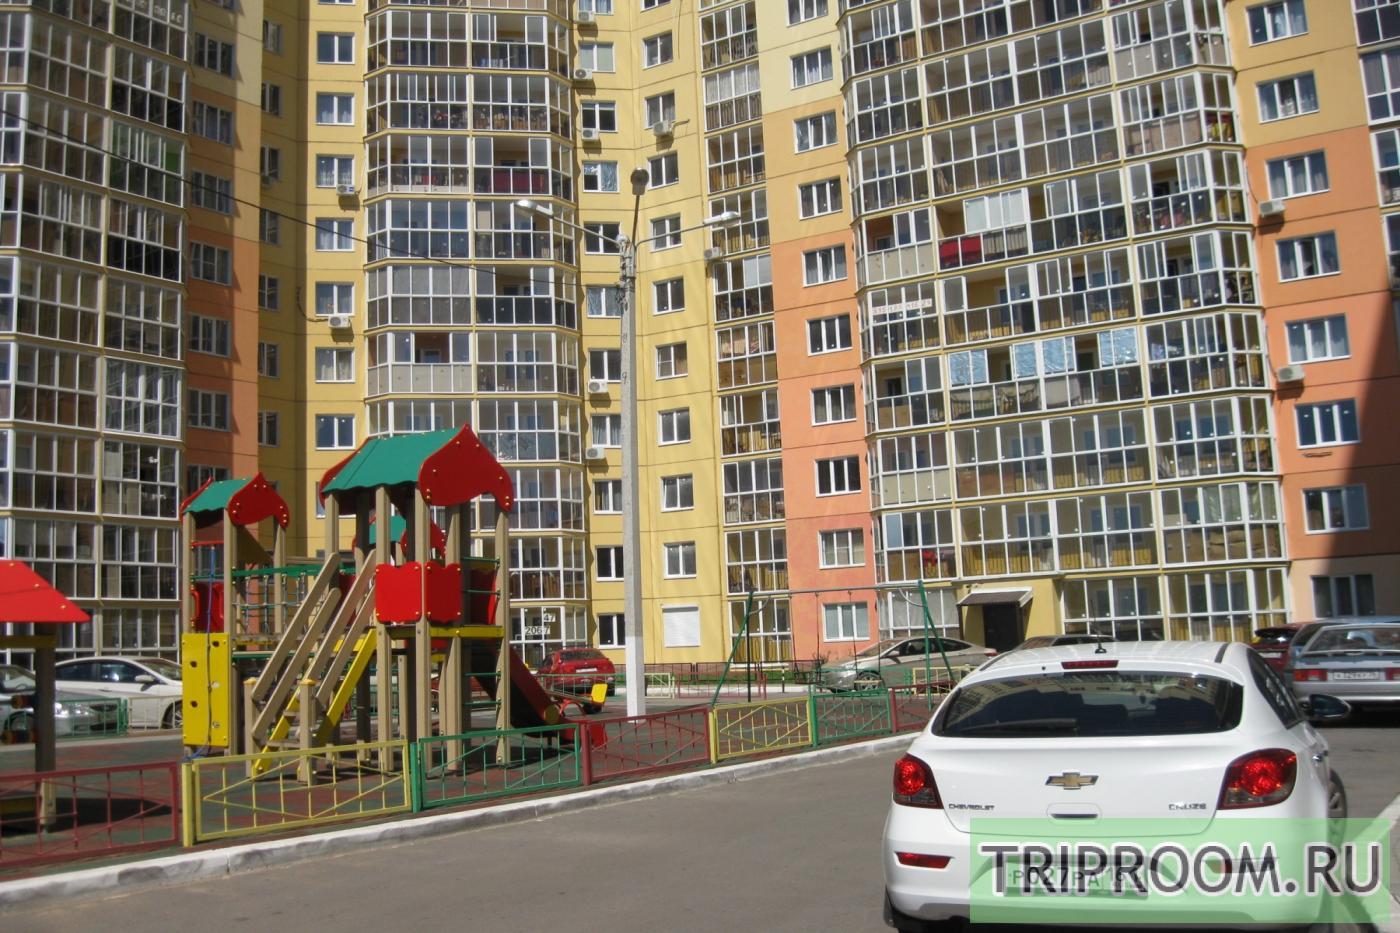 1-комнатная квартира посуточно (вариант № 22849), ул. Шишкова улица, фото № 7